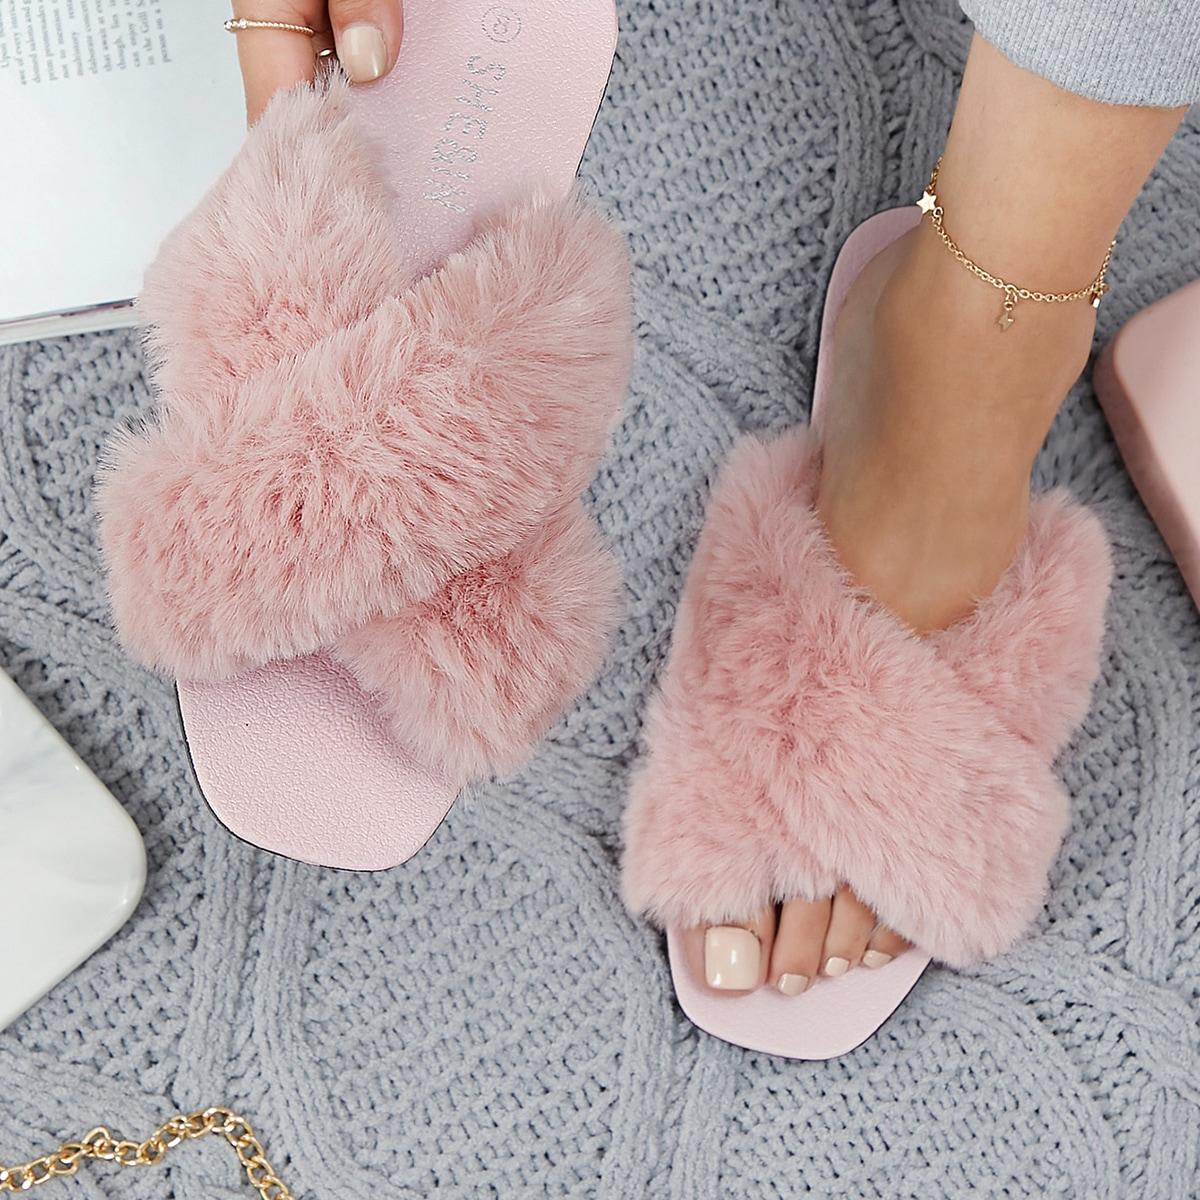 SHEIN / Faux Fur Square Toe Crisscross Sandals